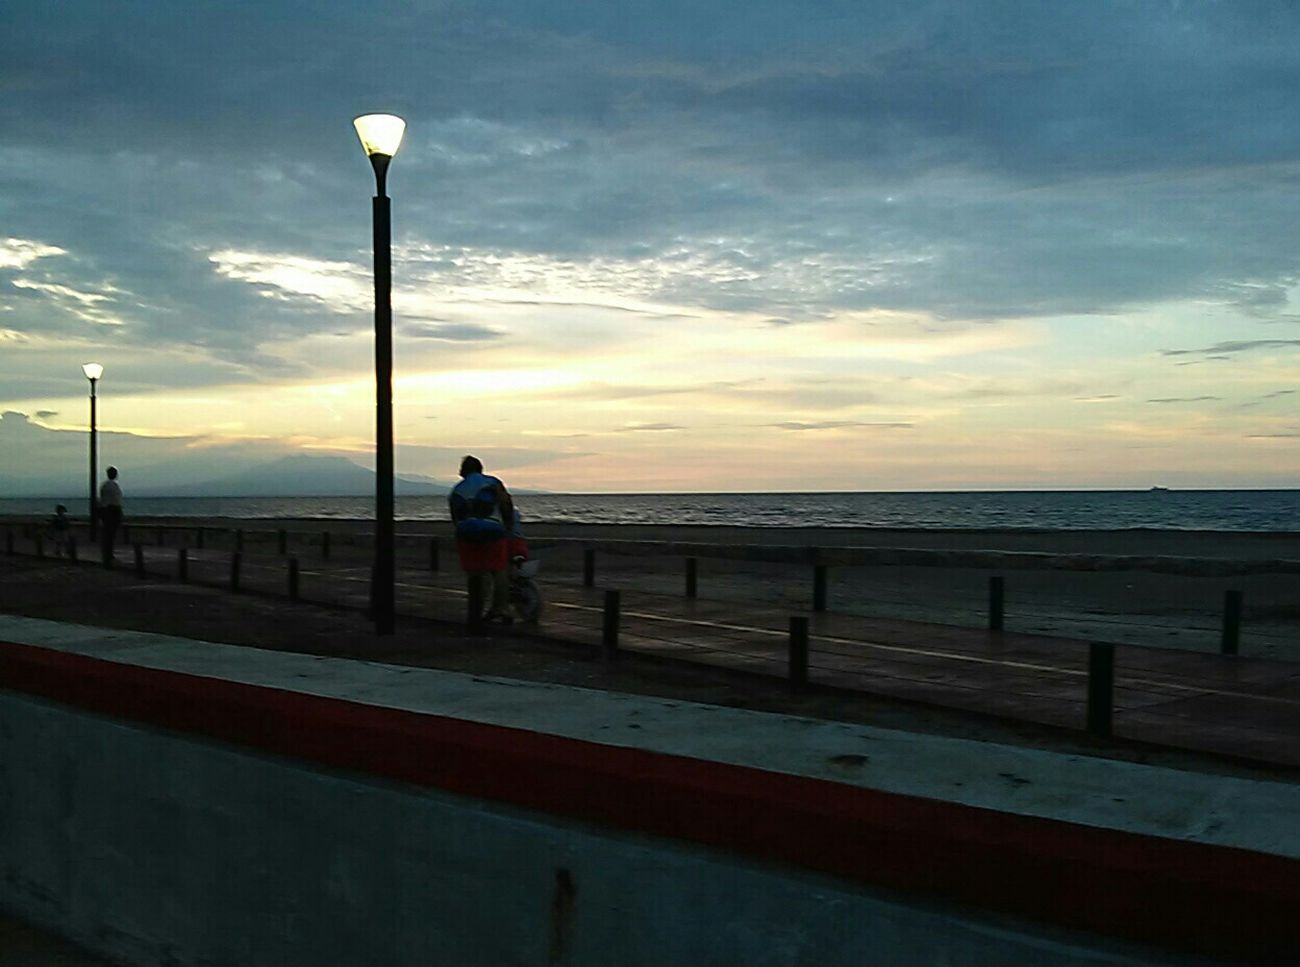 Going The Distance Mi Hermoso Puerto Beachcoatza. Atardecer En Coatzacoalcos Urban Lifestyle Vive_mexico Mexico De Mis Amores Caminata Beautiful Nature Betsfriend